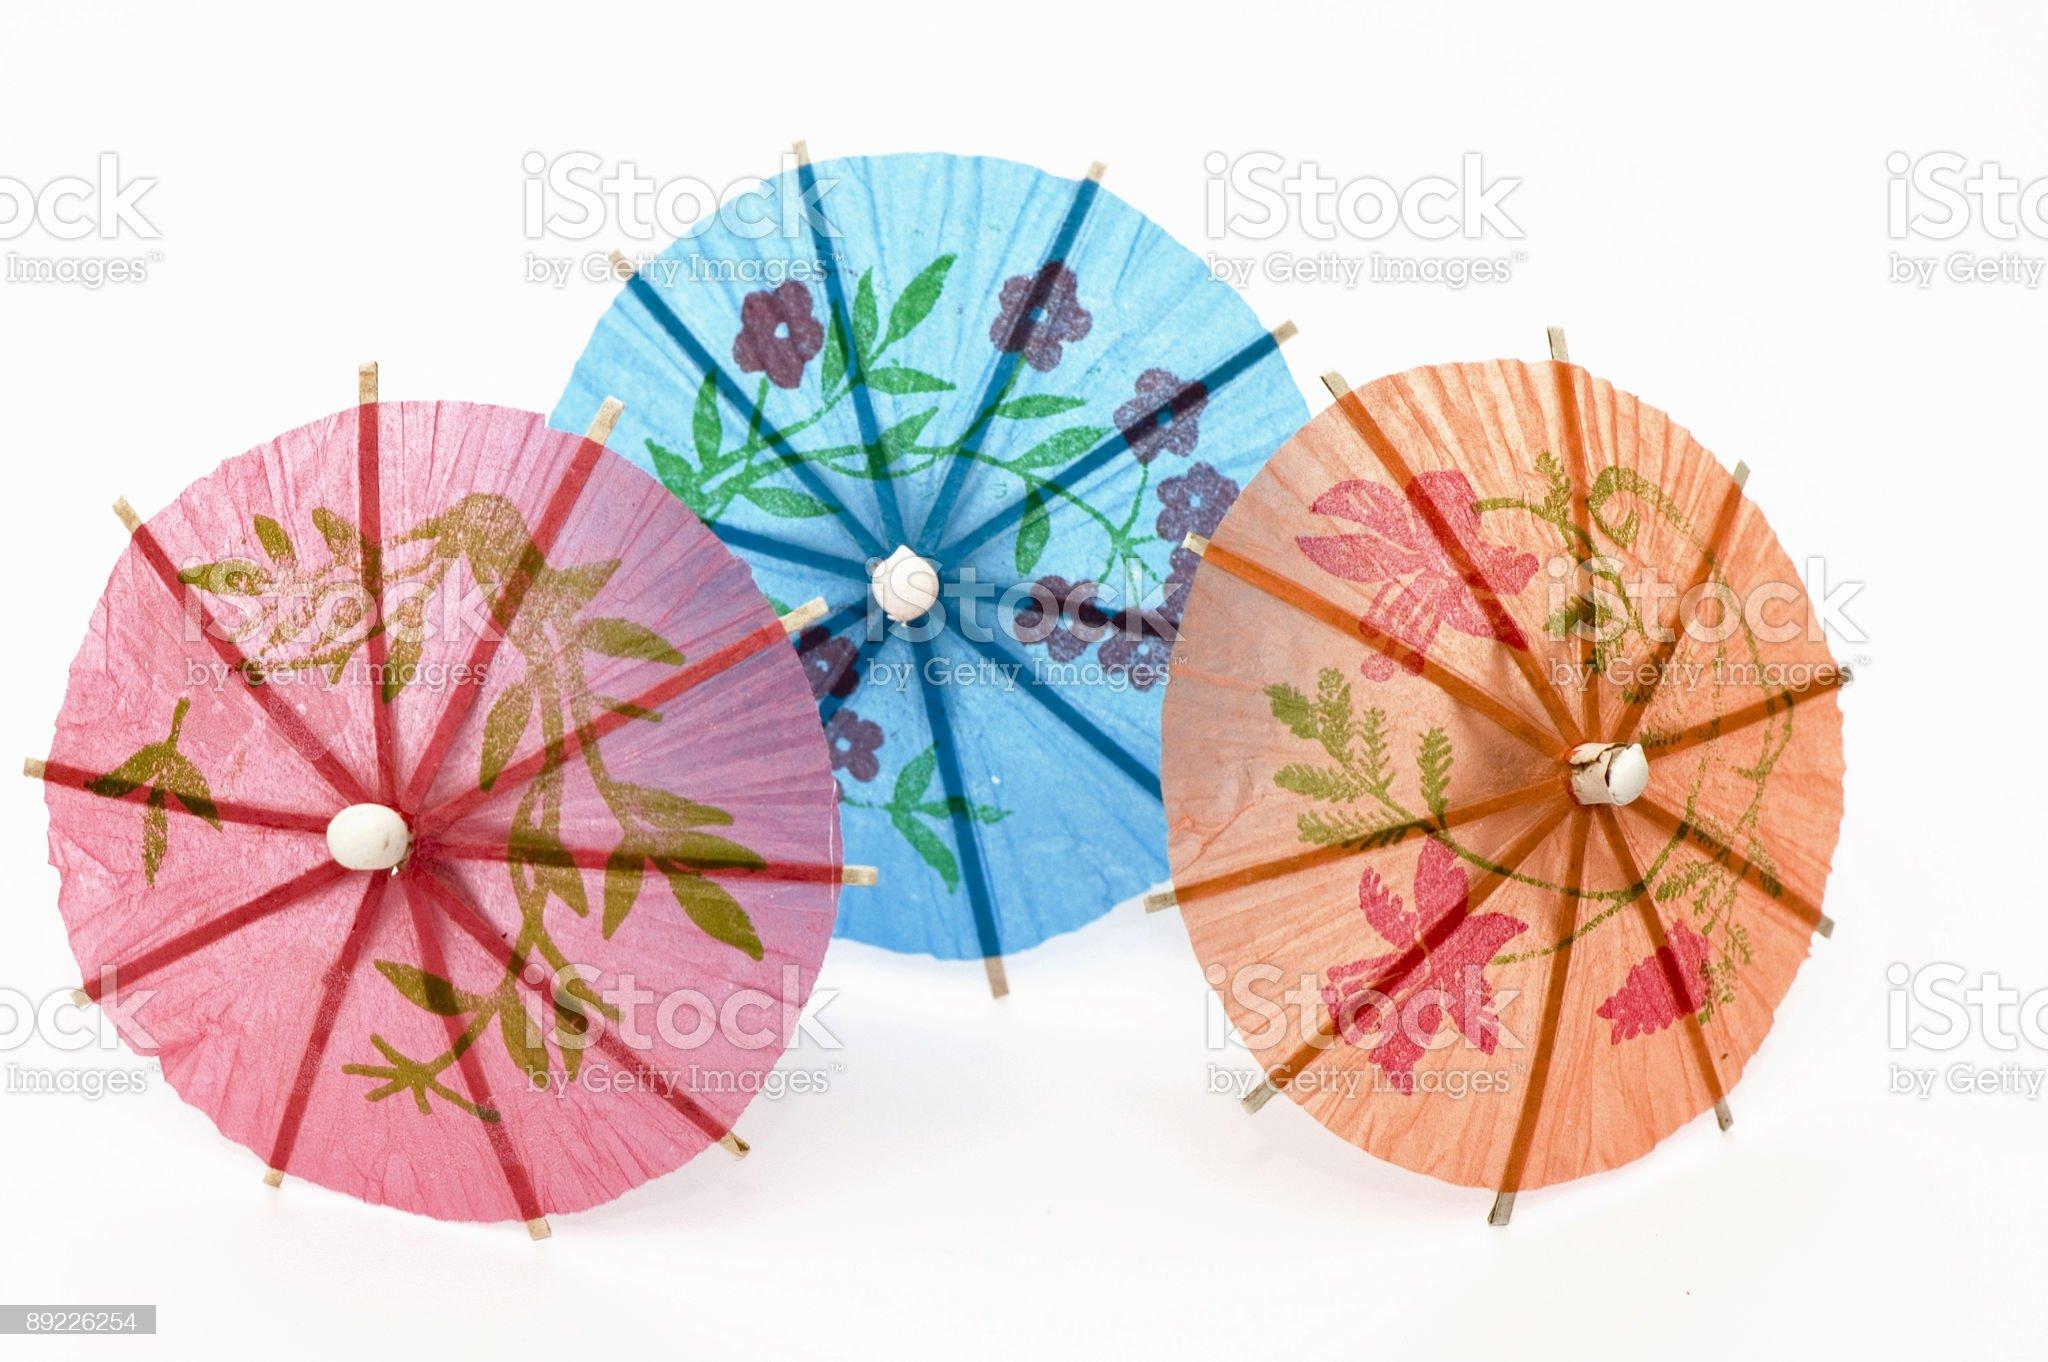 Three Party Umbrellas royalty-free stock photo